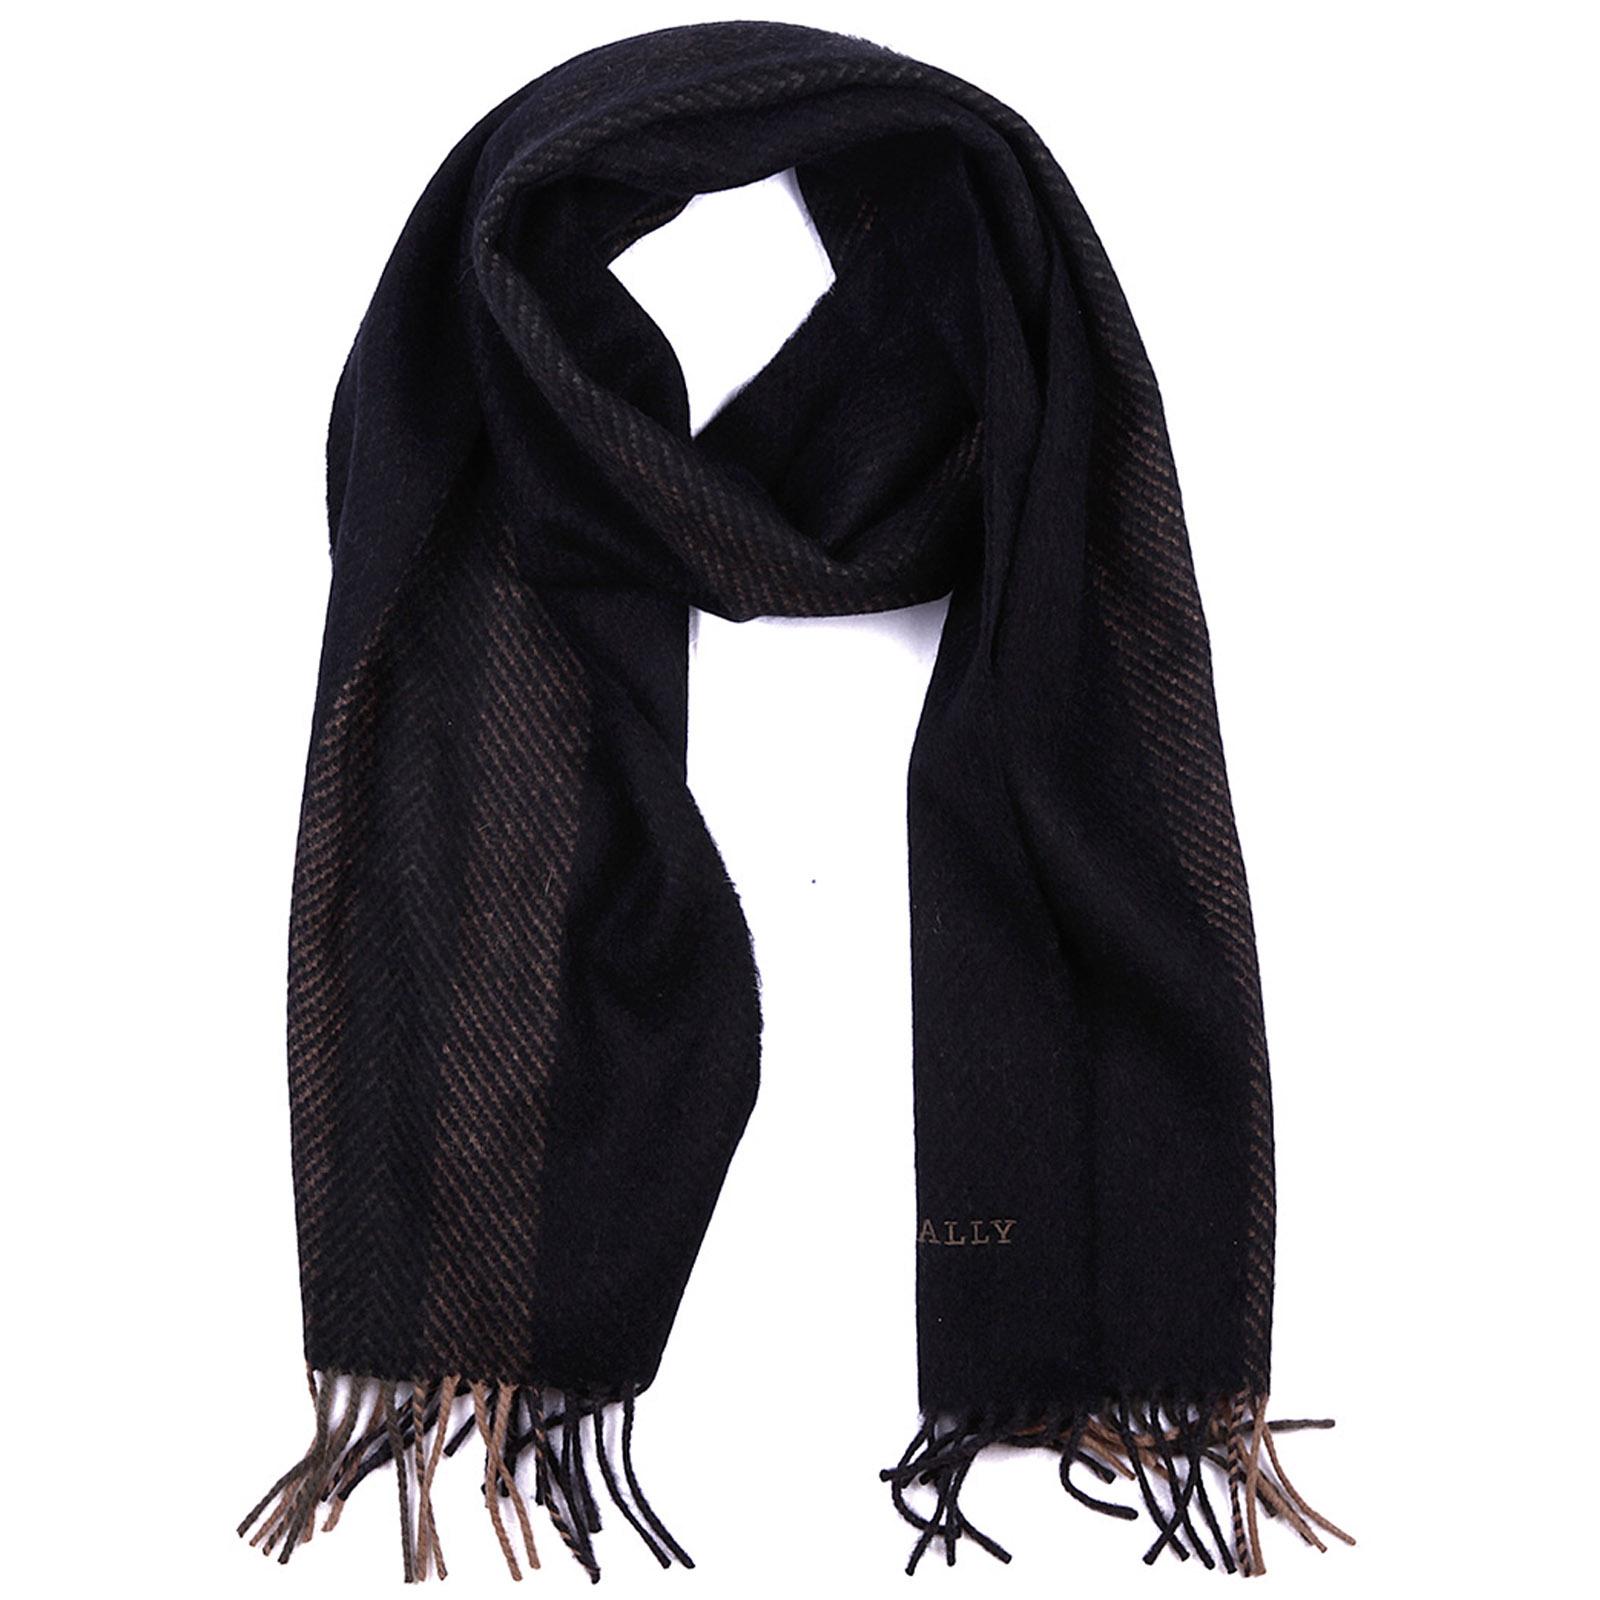 Men's wool scarf multi dark grey jacquard